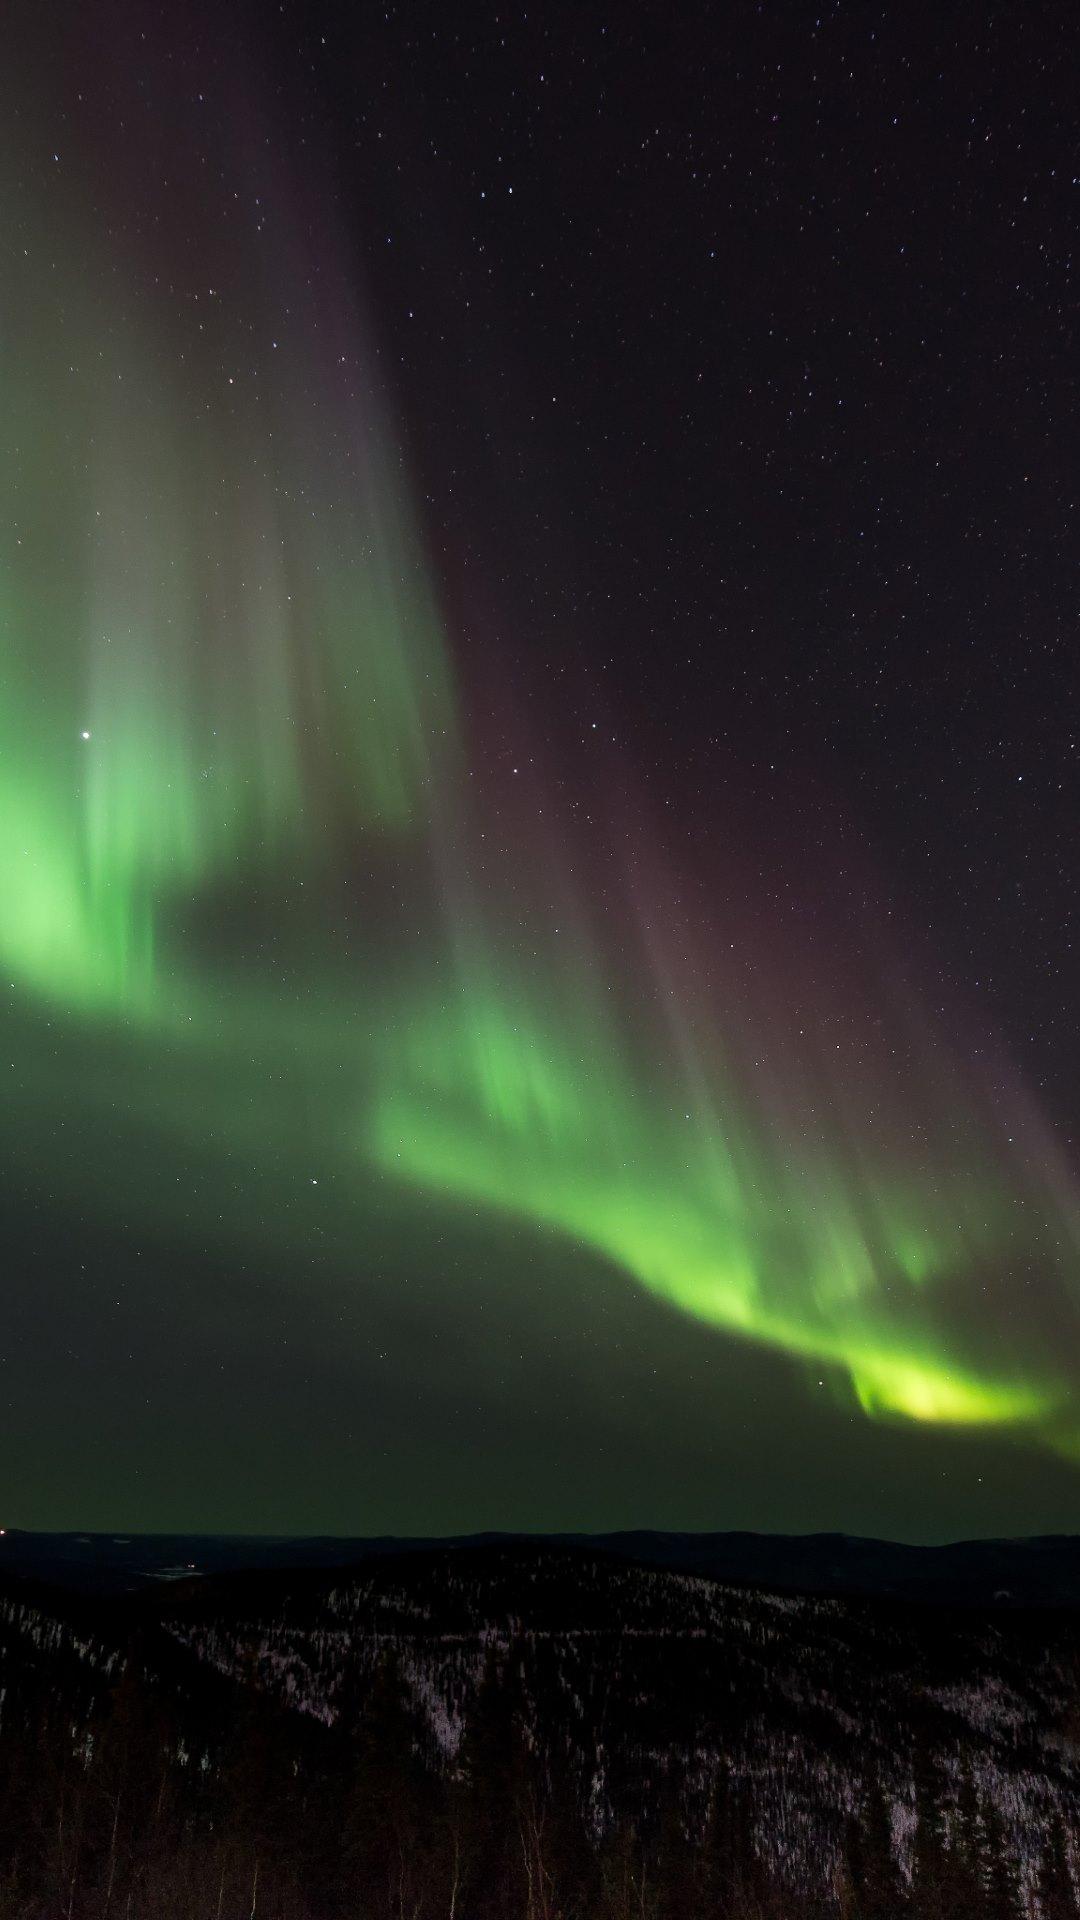 northern lights wallpaper 4k - photo #36